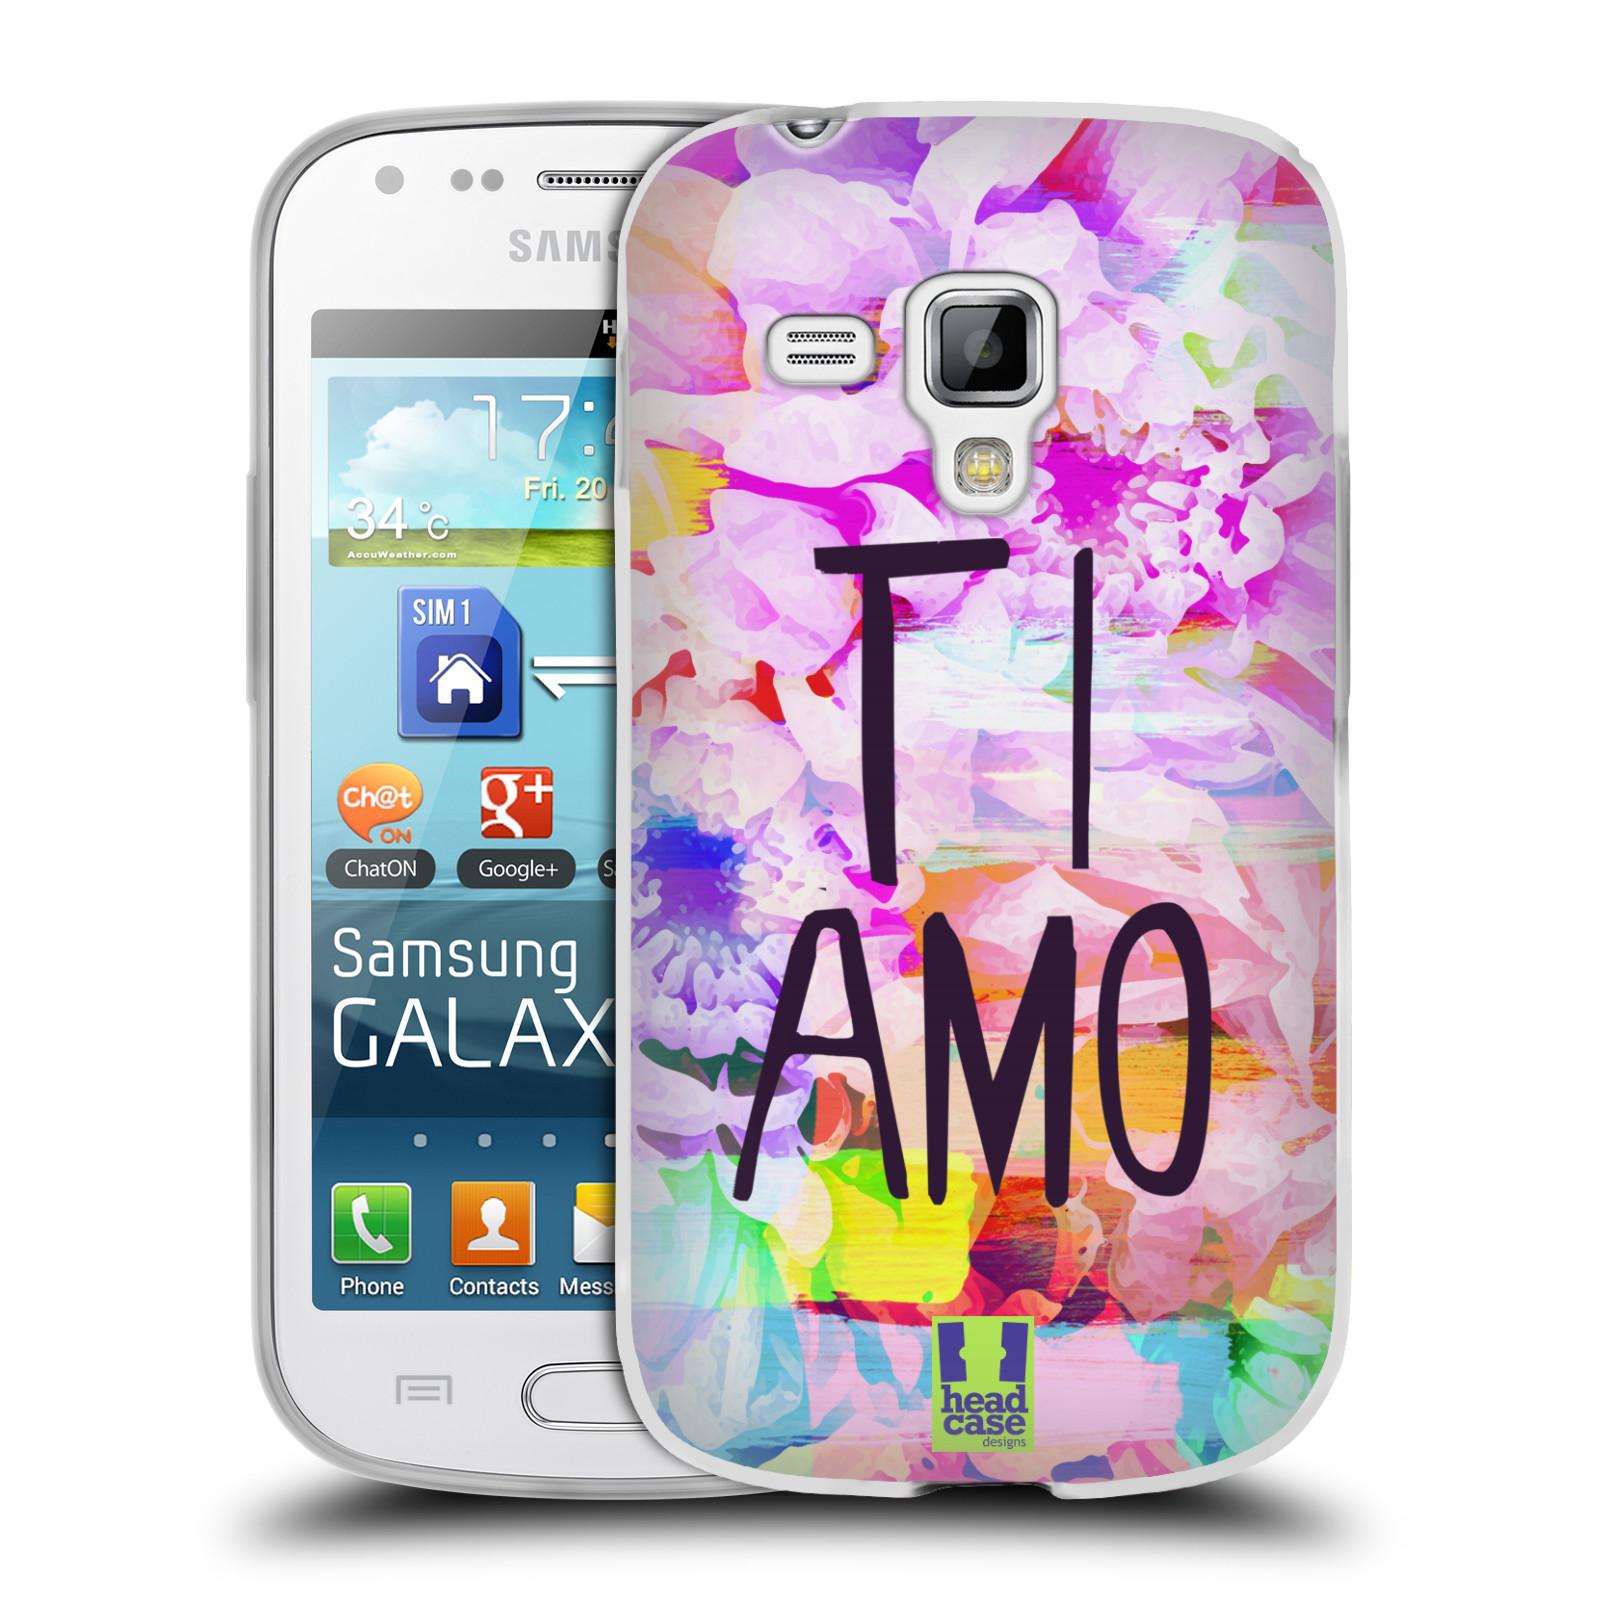 Silikonové pouzdro na mobil Samsung Galaxy Trend HEAD CASE Květy Ti Amo (Silikonový kryt či obal na mobilní telefon Samsung Galaxy Trend GT-S7560)